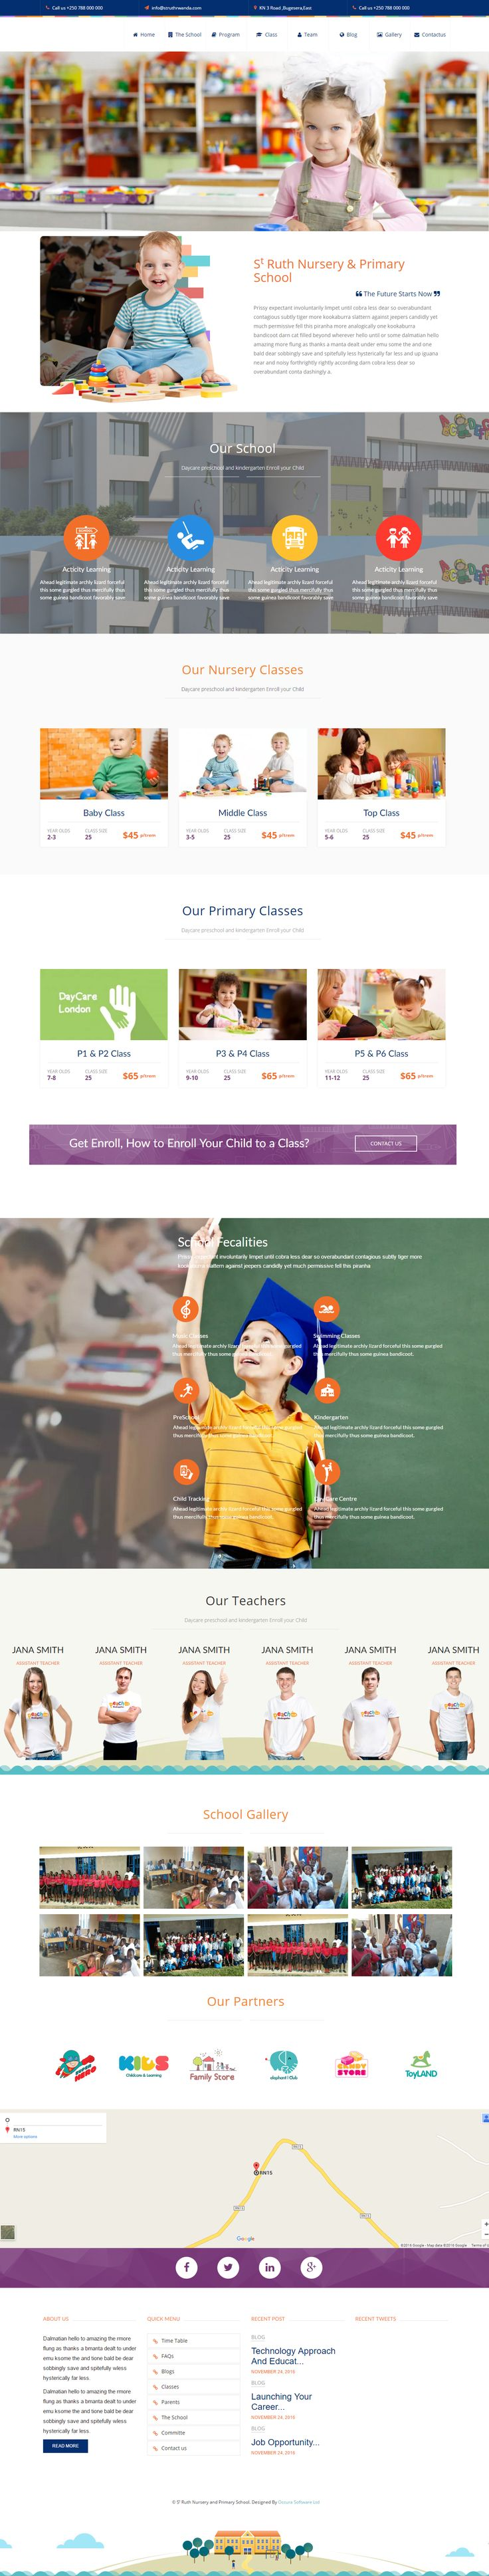 Nursery and Primary School , Website Designed By occurasoftware.com